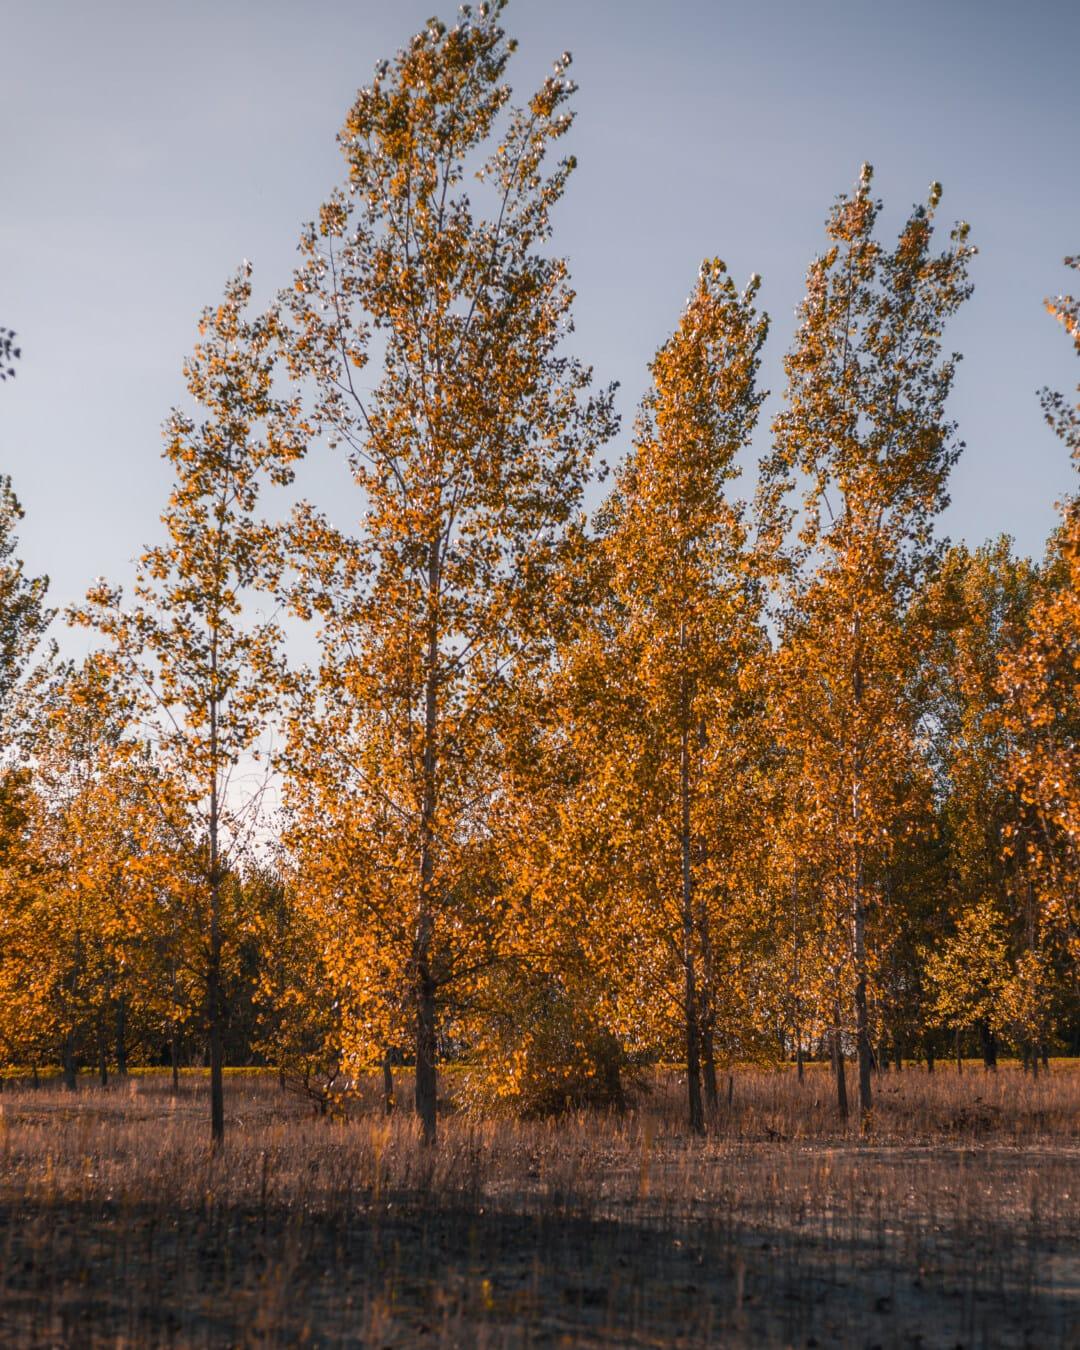 Plop, copaci, pădure, toamna, peisaj, mesteacan, copac, sezon, galben, parcul